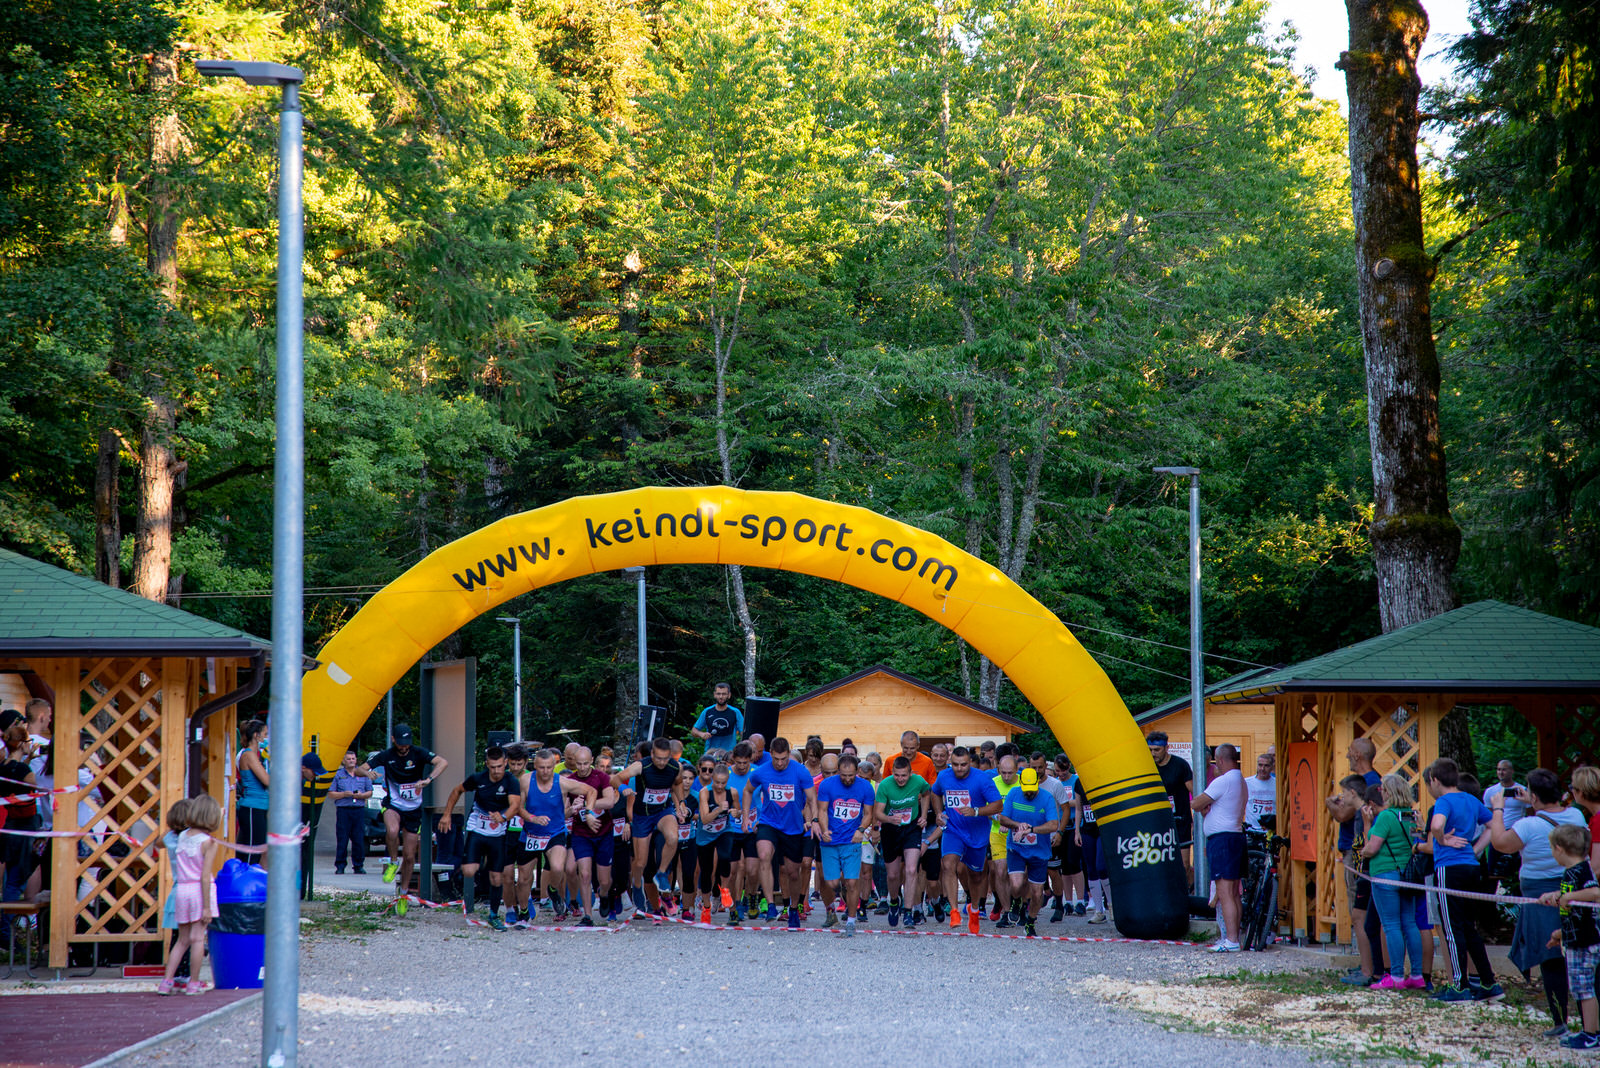 likaclub_lika night run_jasikovac_7_2020 (7)